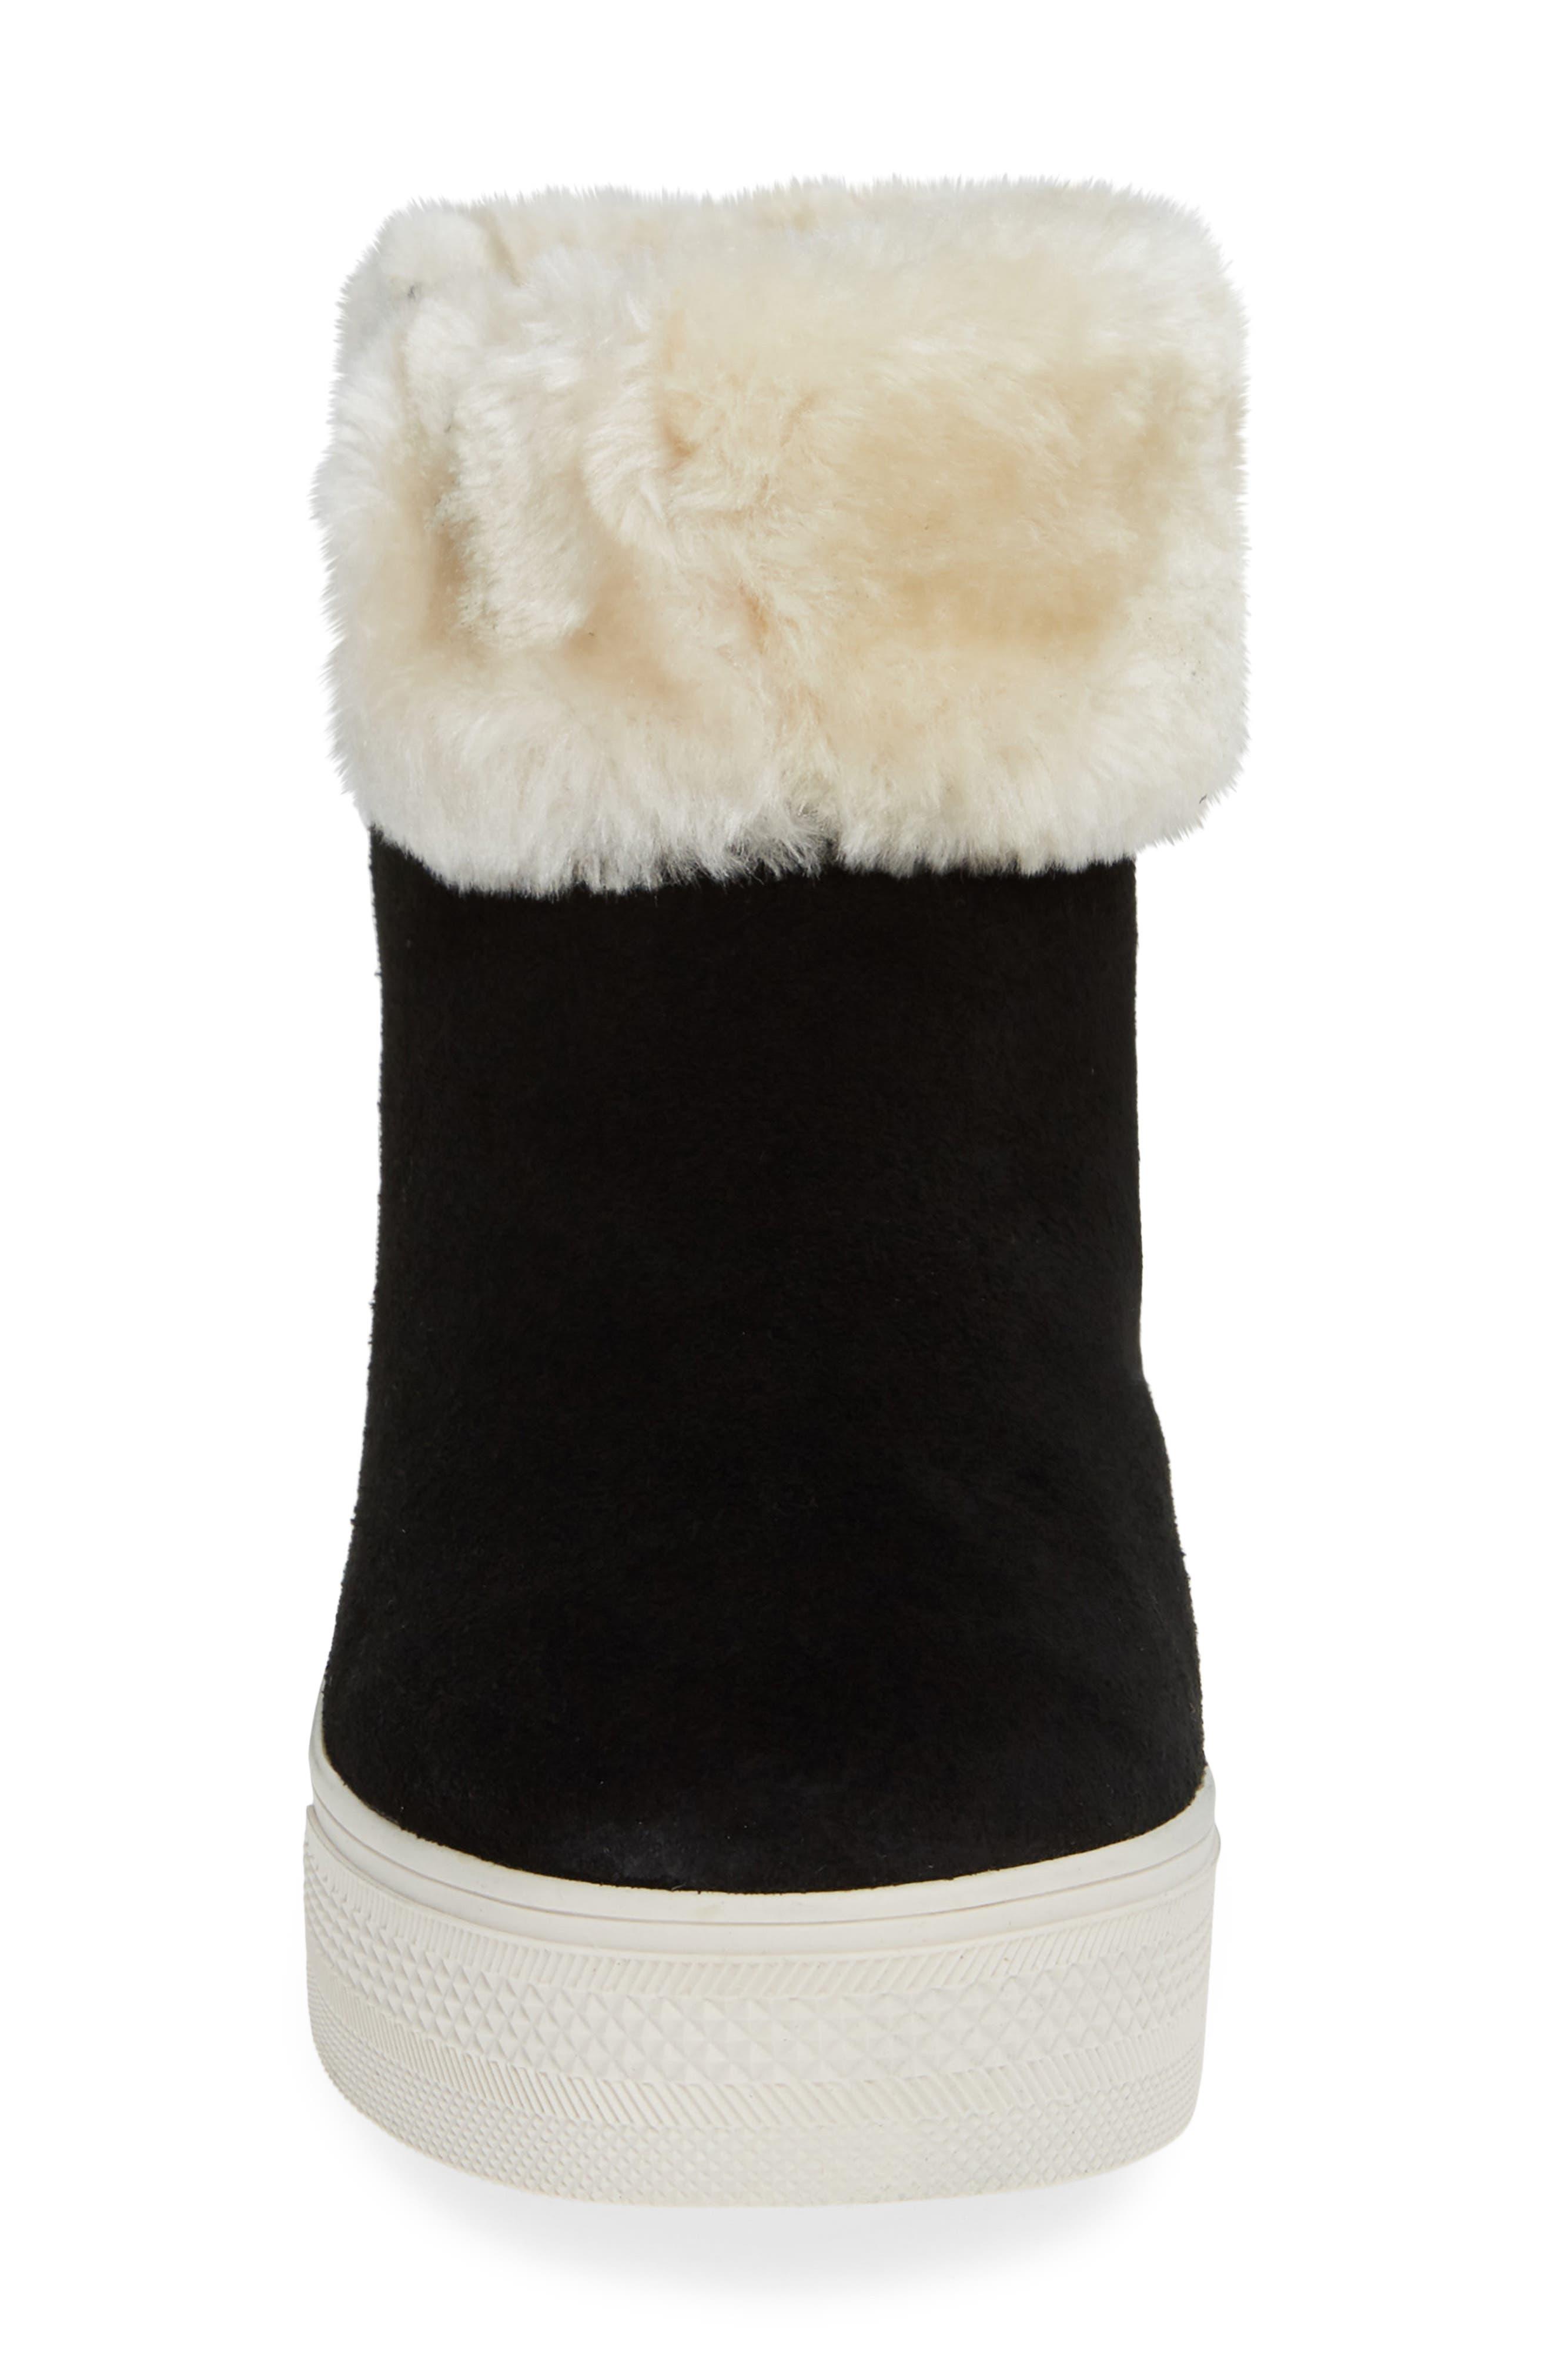 STEVE MADDEN,                             Faux Fur Lined Sneaker,                             Alternate thumbnail 4, color,                             006